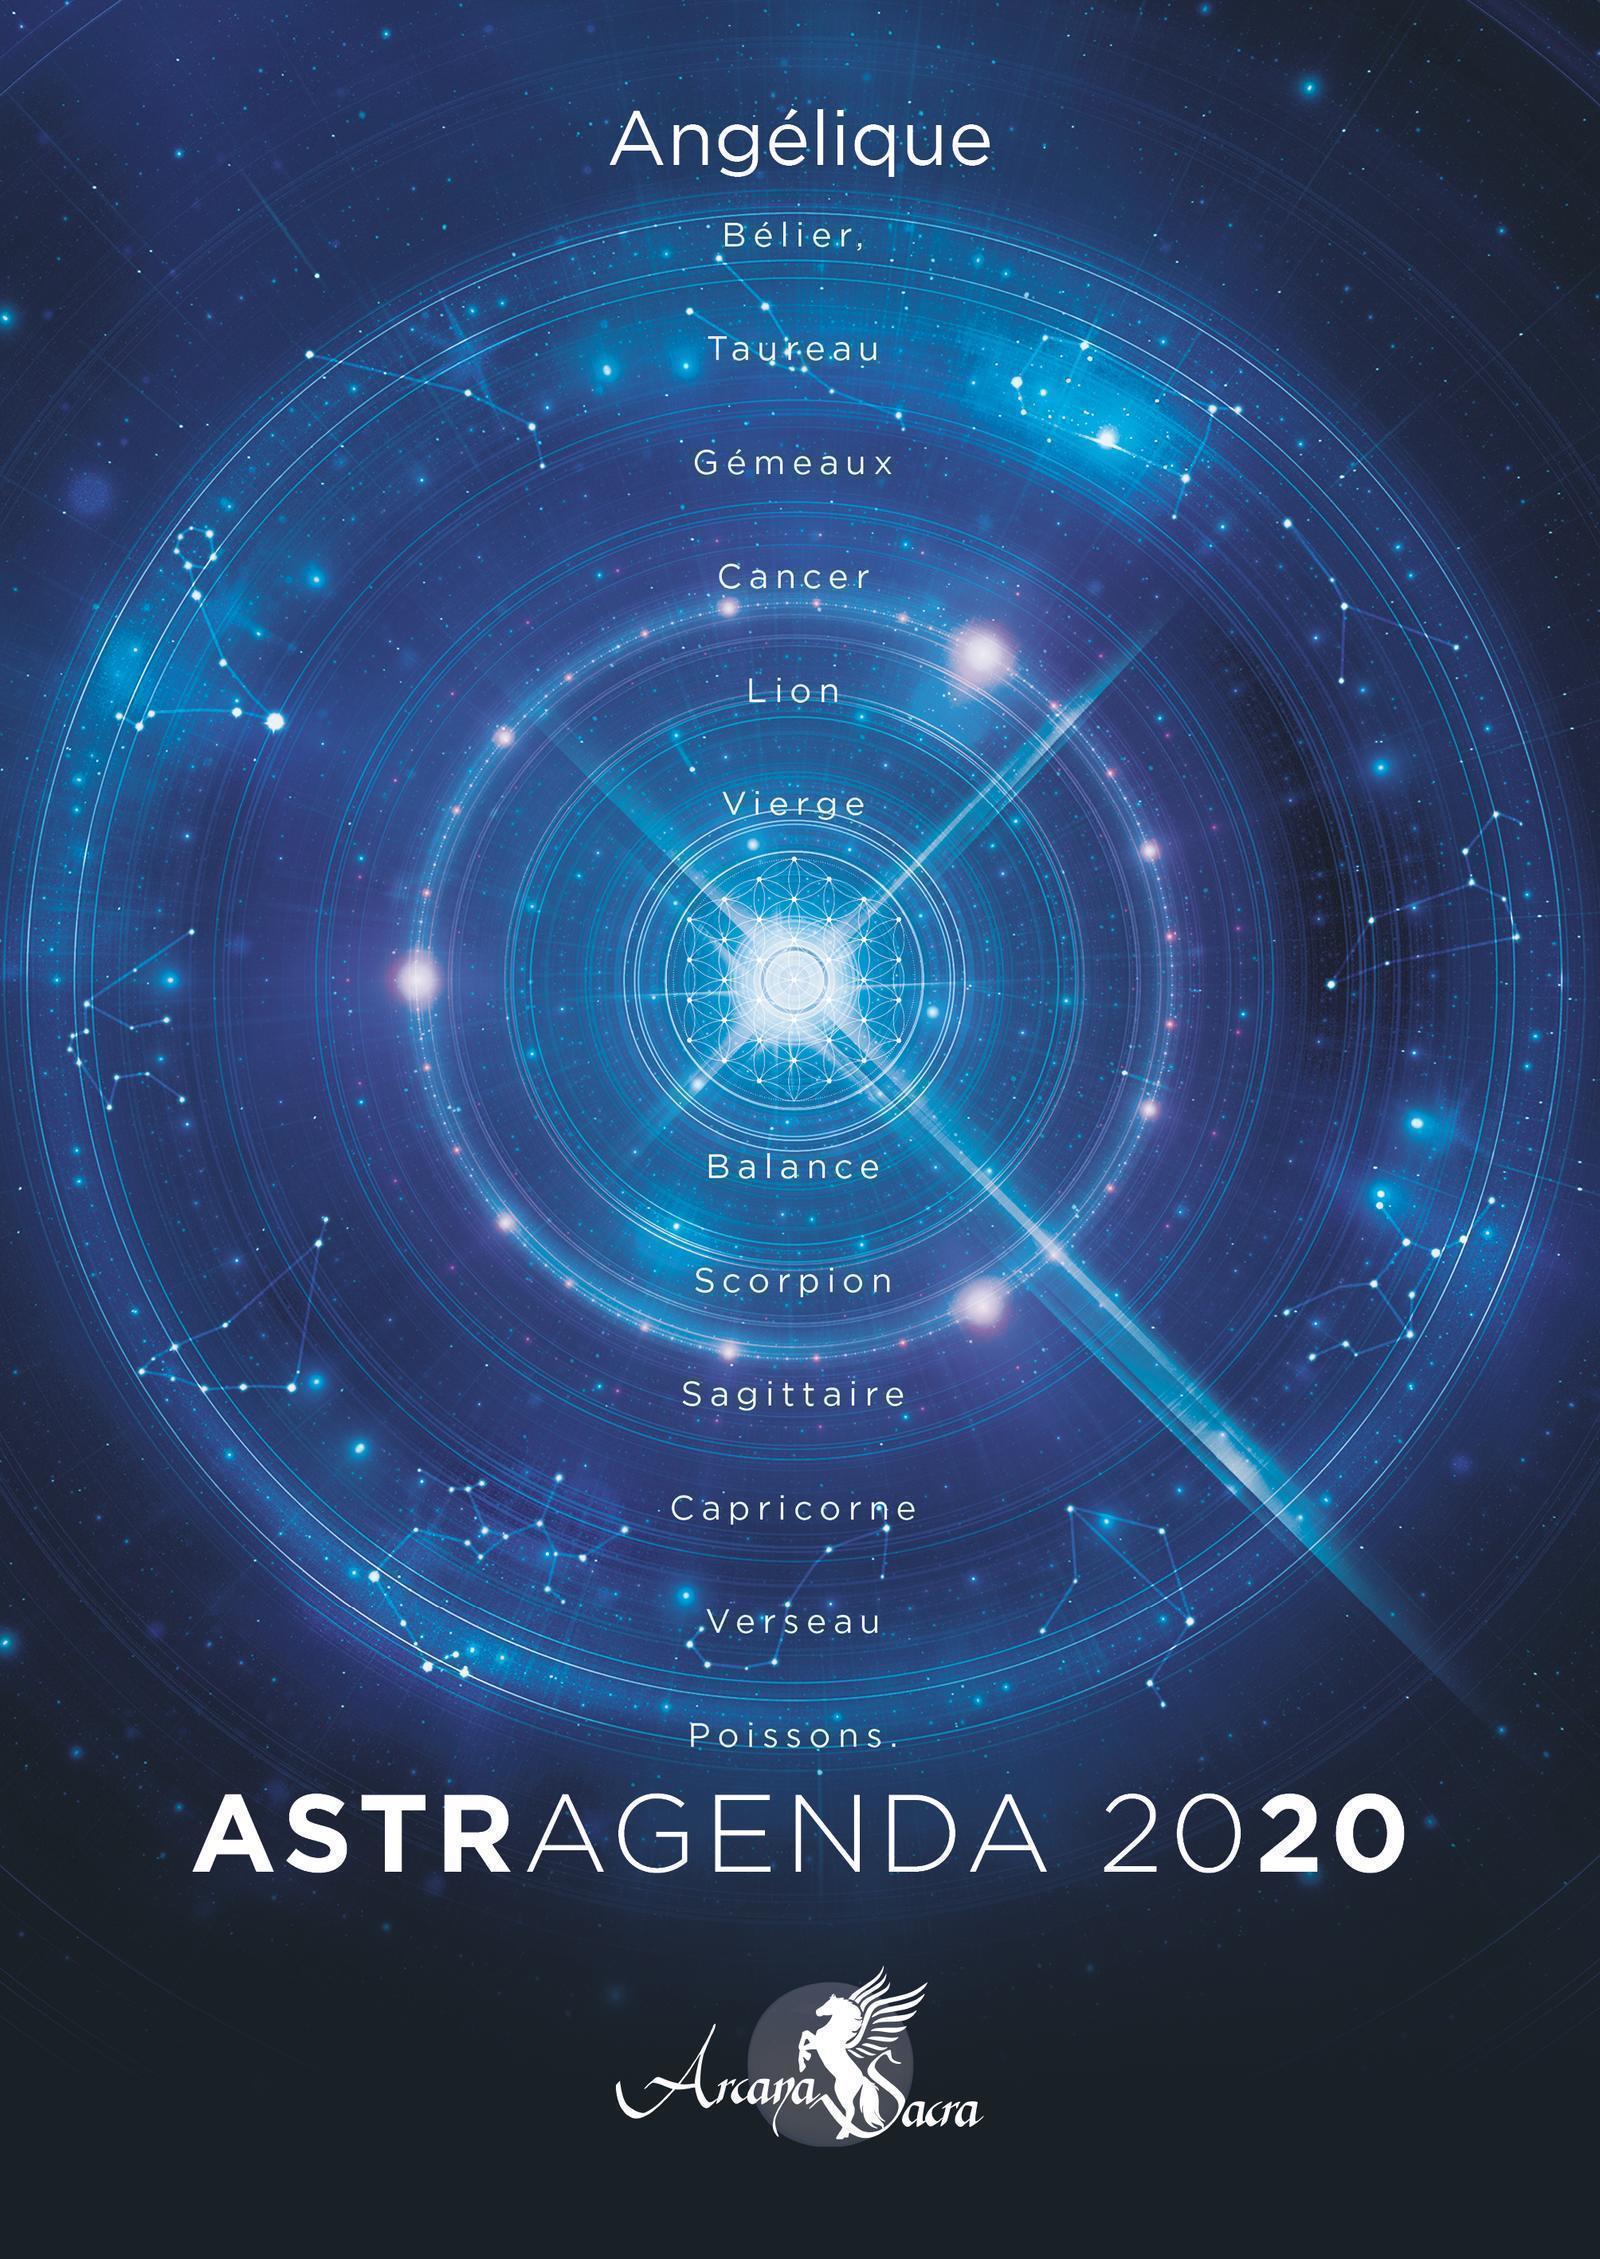 ASTRAGENDA 2020